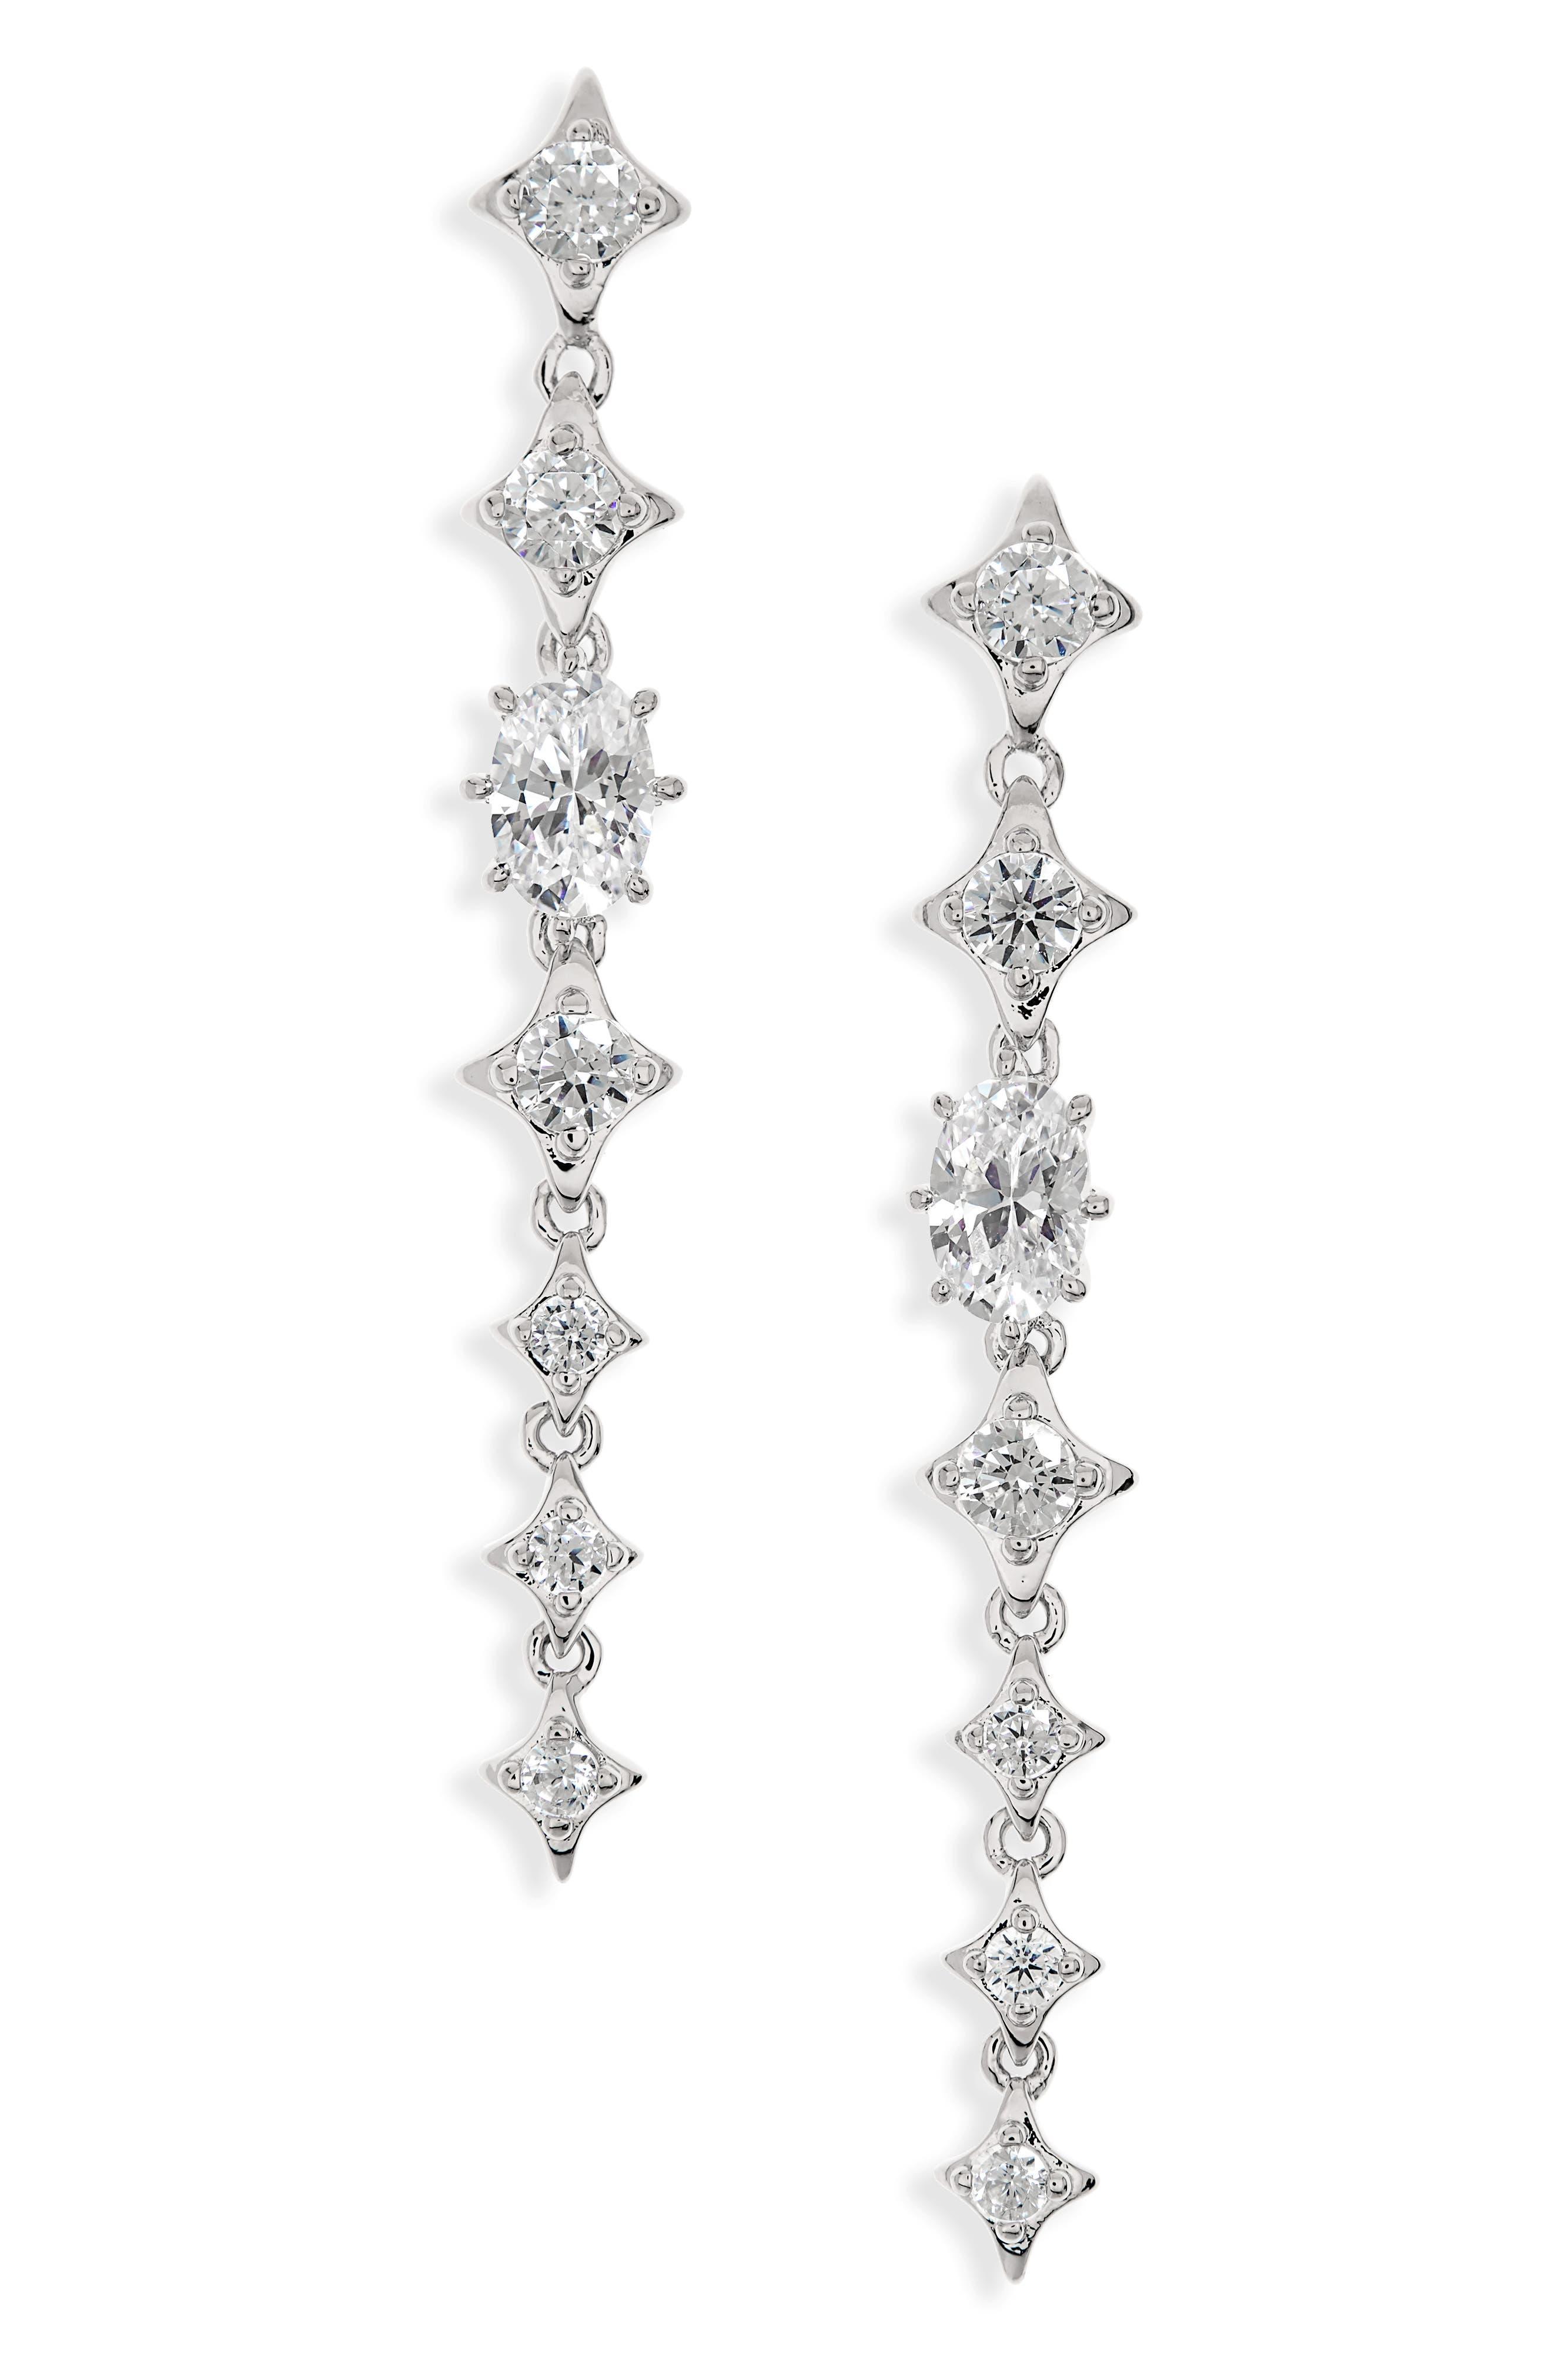 Boho Linear Drop Earrings,                             Main thumbnail 1, color,                             Silver/ Clear